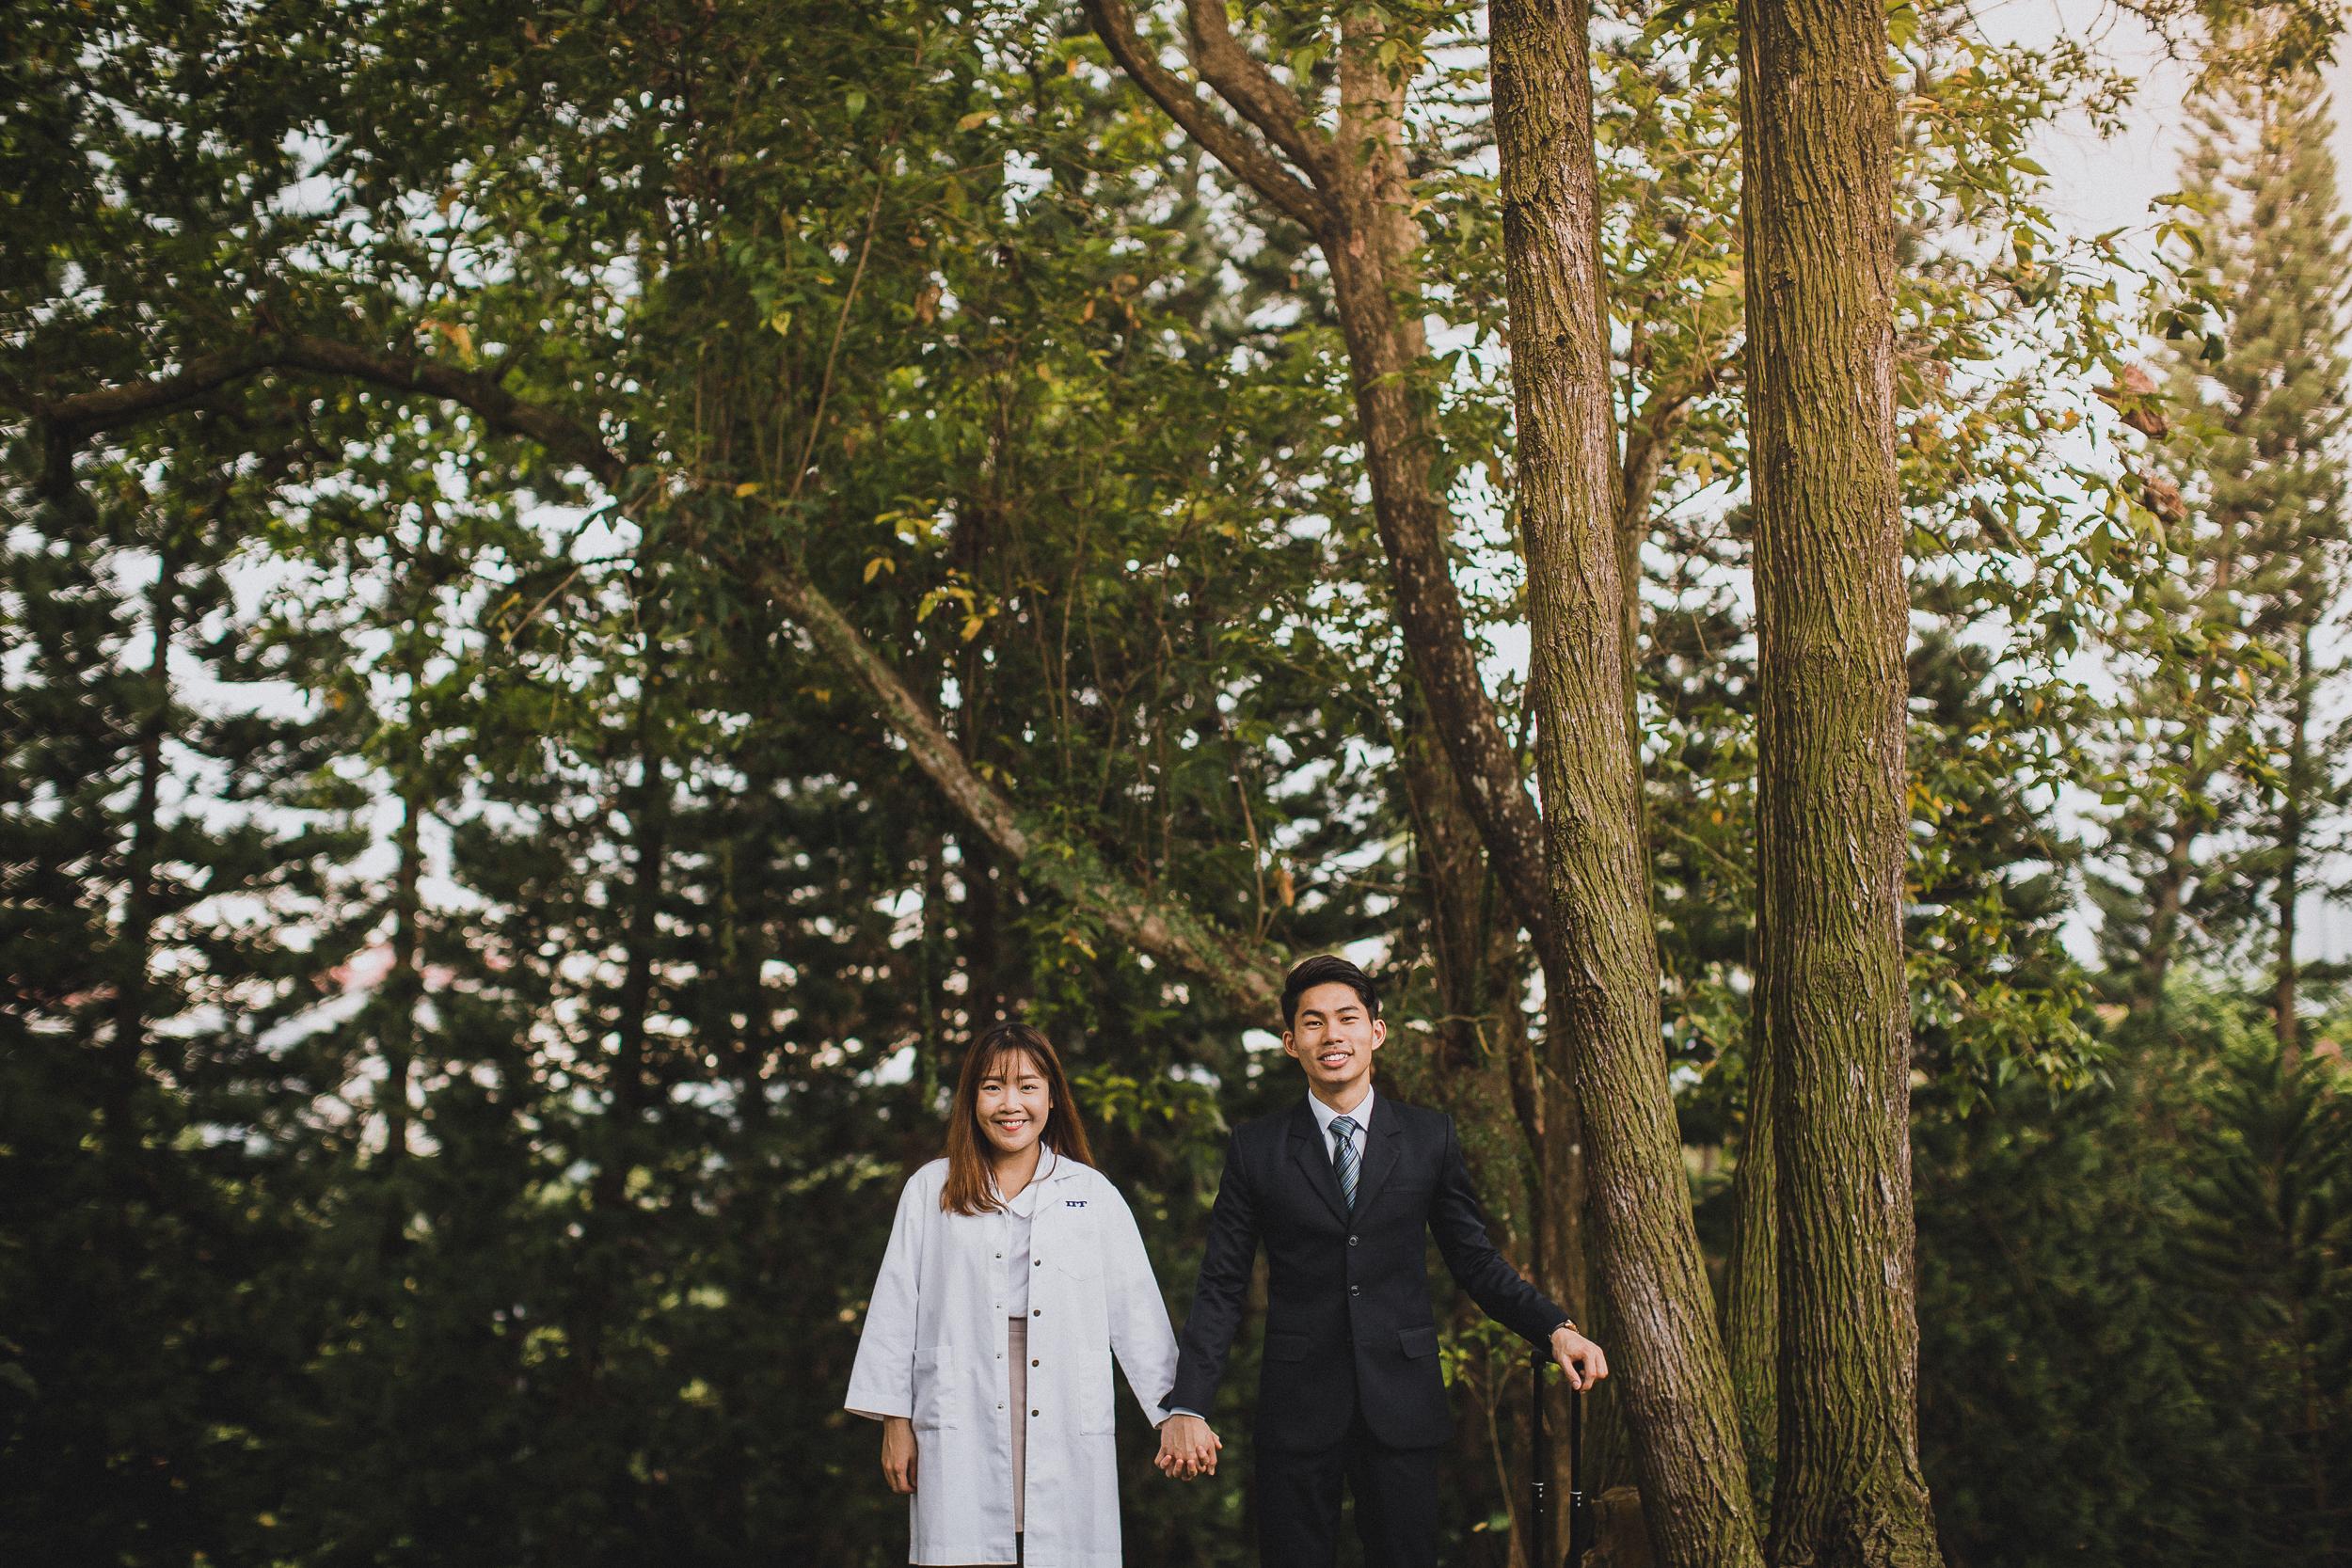 Singapore+Wedding+Photographer+Pre-Wedding+Couple+Zhiyu+Huimin-0040.jpg